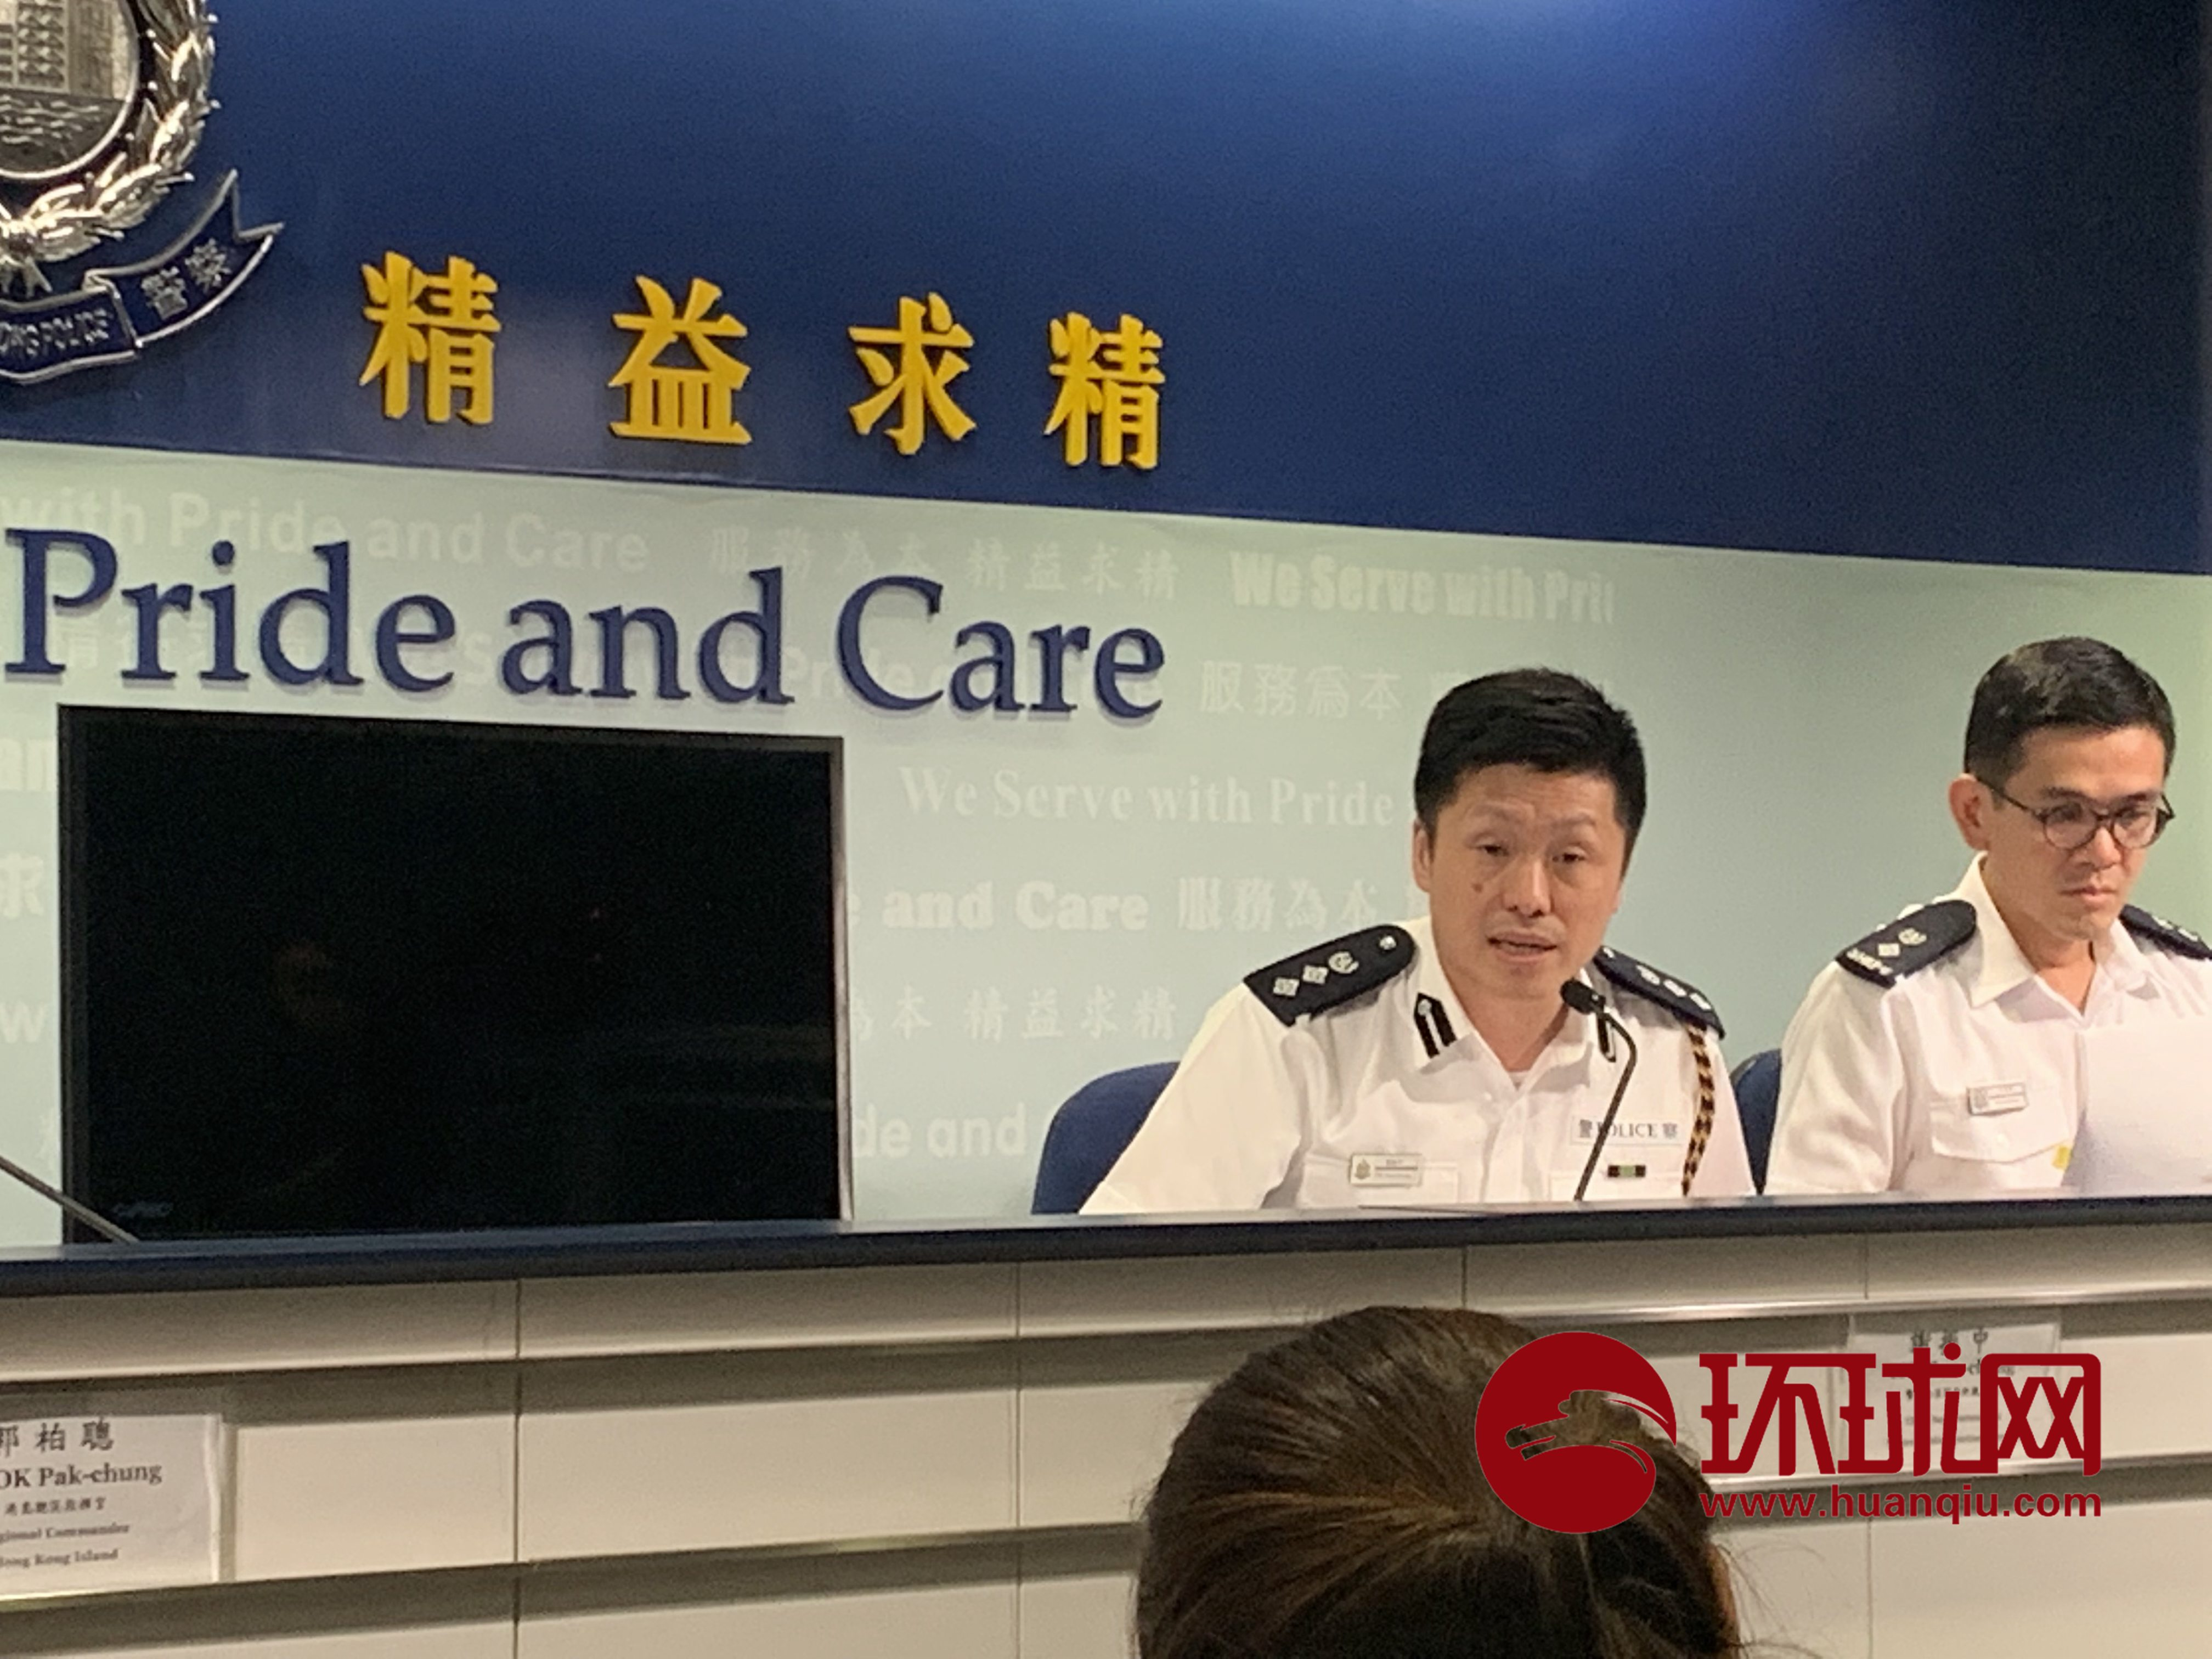 <b>香港警方确认受邀参加国庆庆典:10人受邀,包括管理层与前线人员</b>